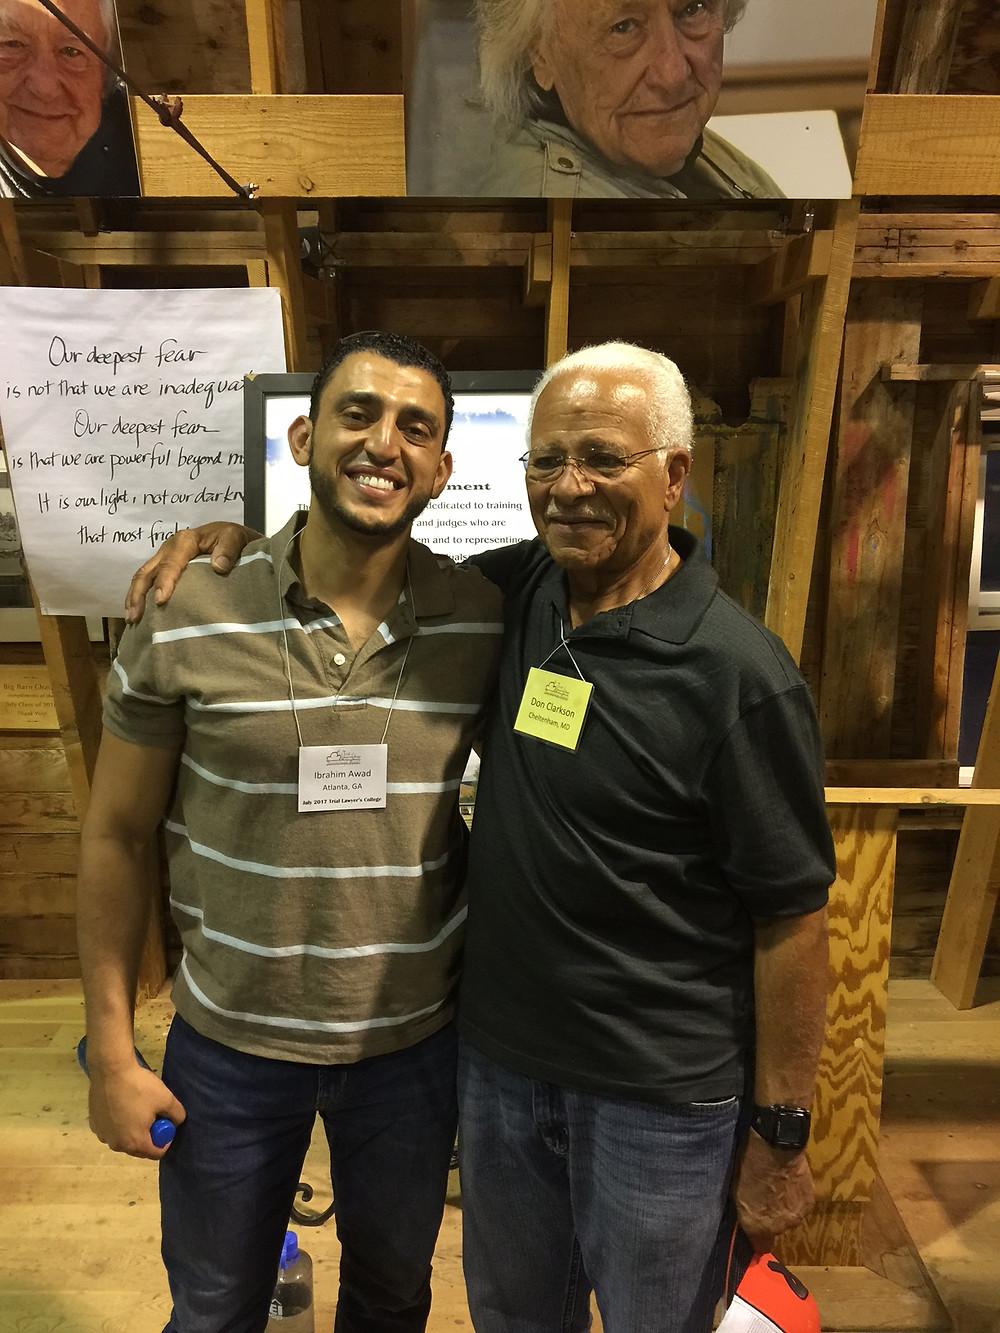 Ibrahim Awad and Don Clarkson